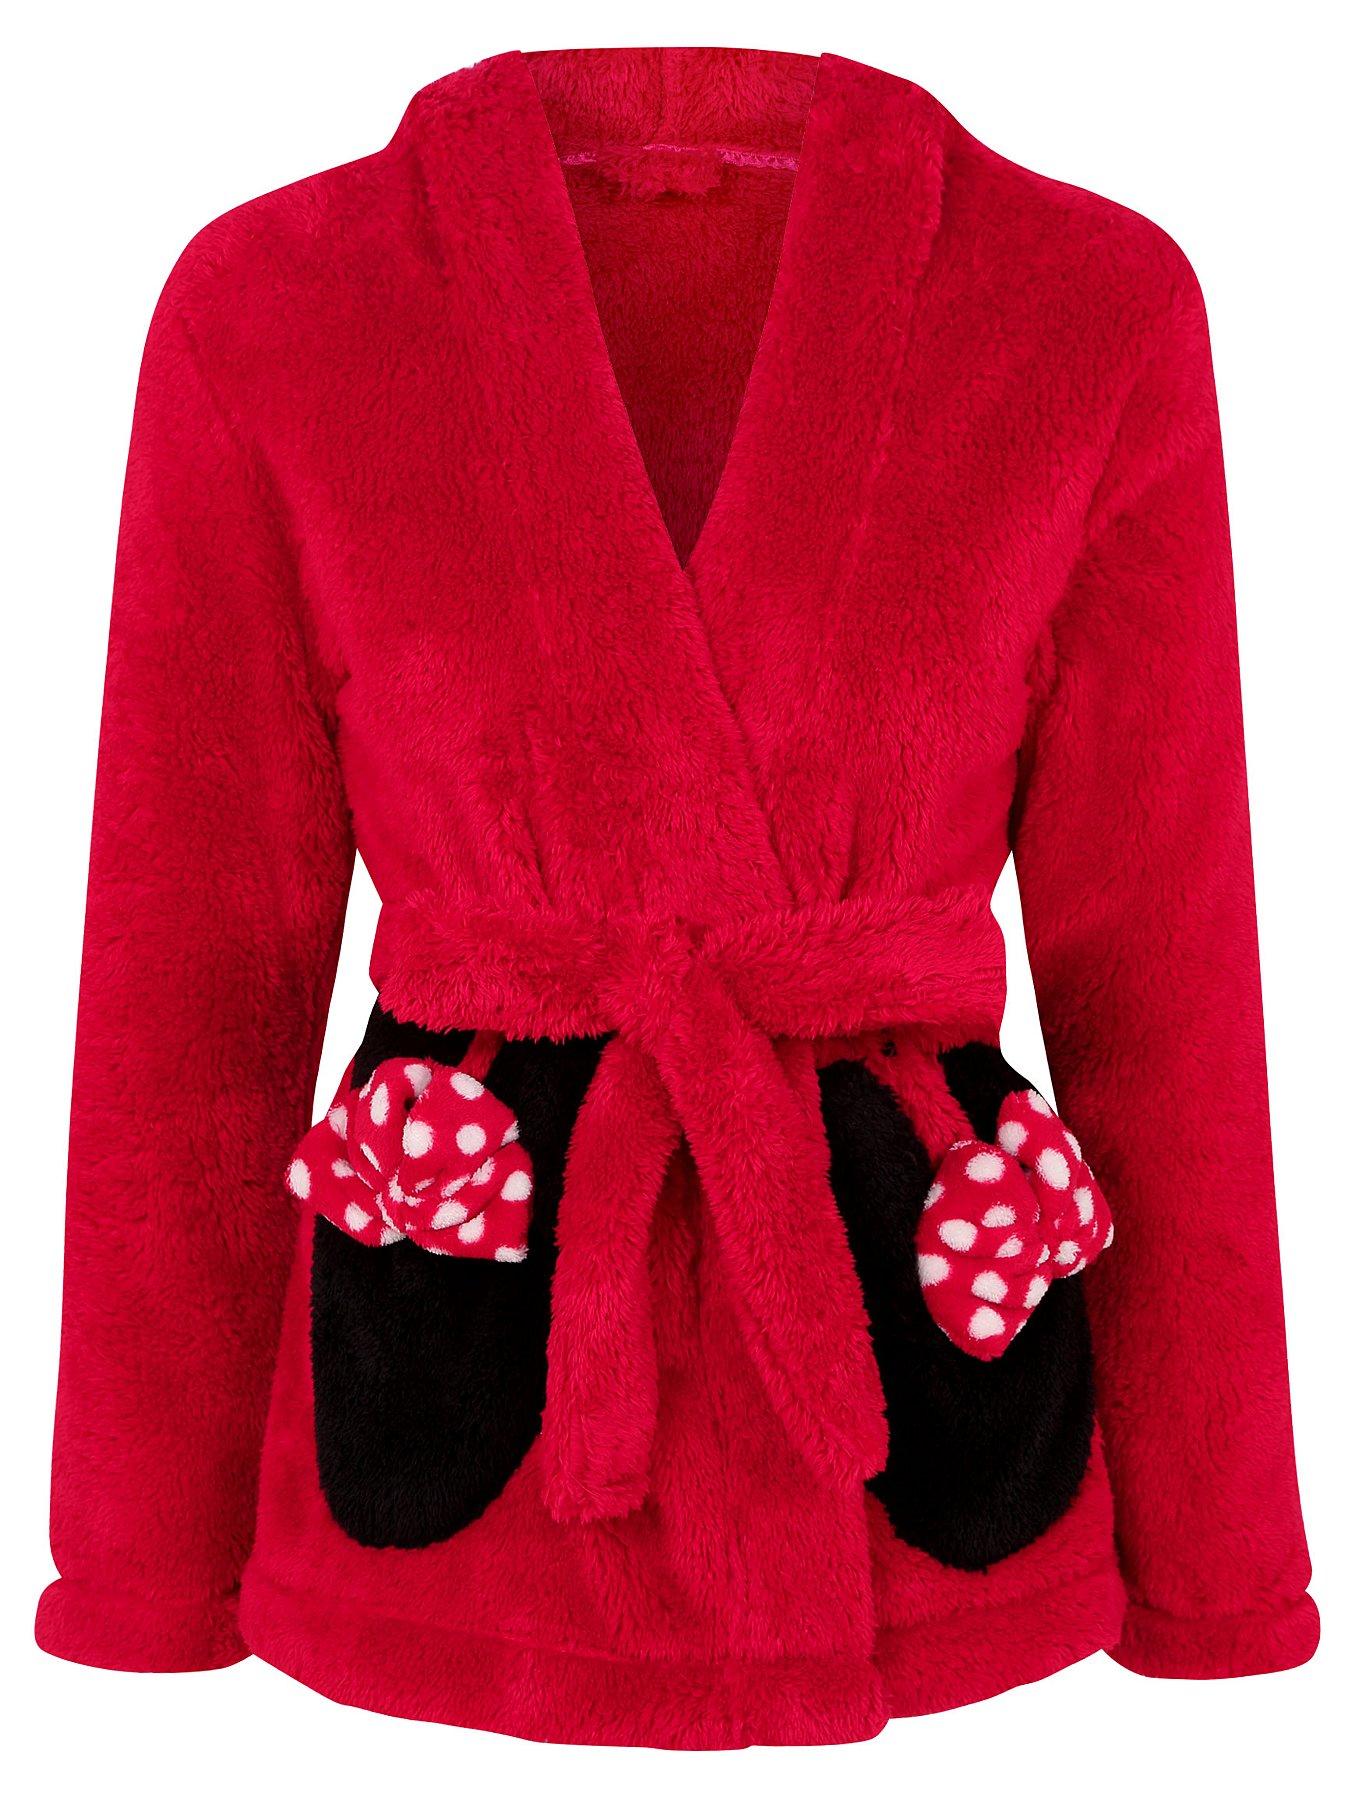 Disney Minnie Mouse 3 Piece Dressing Gown and Pyjama Set | Women ...